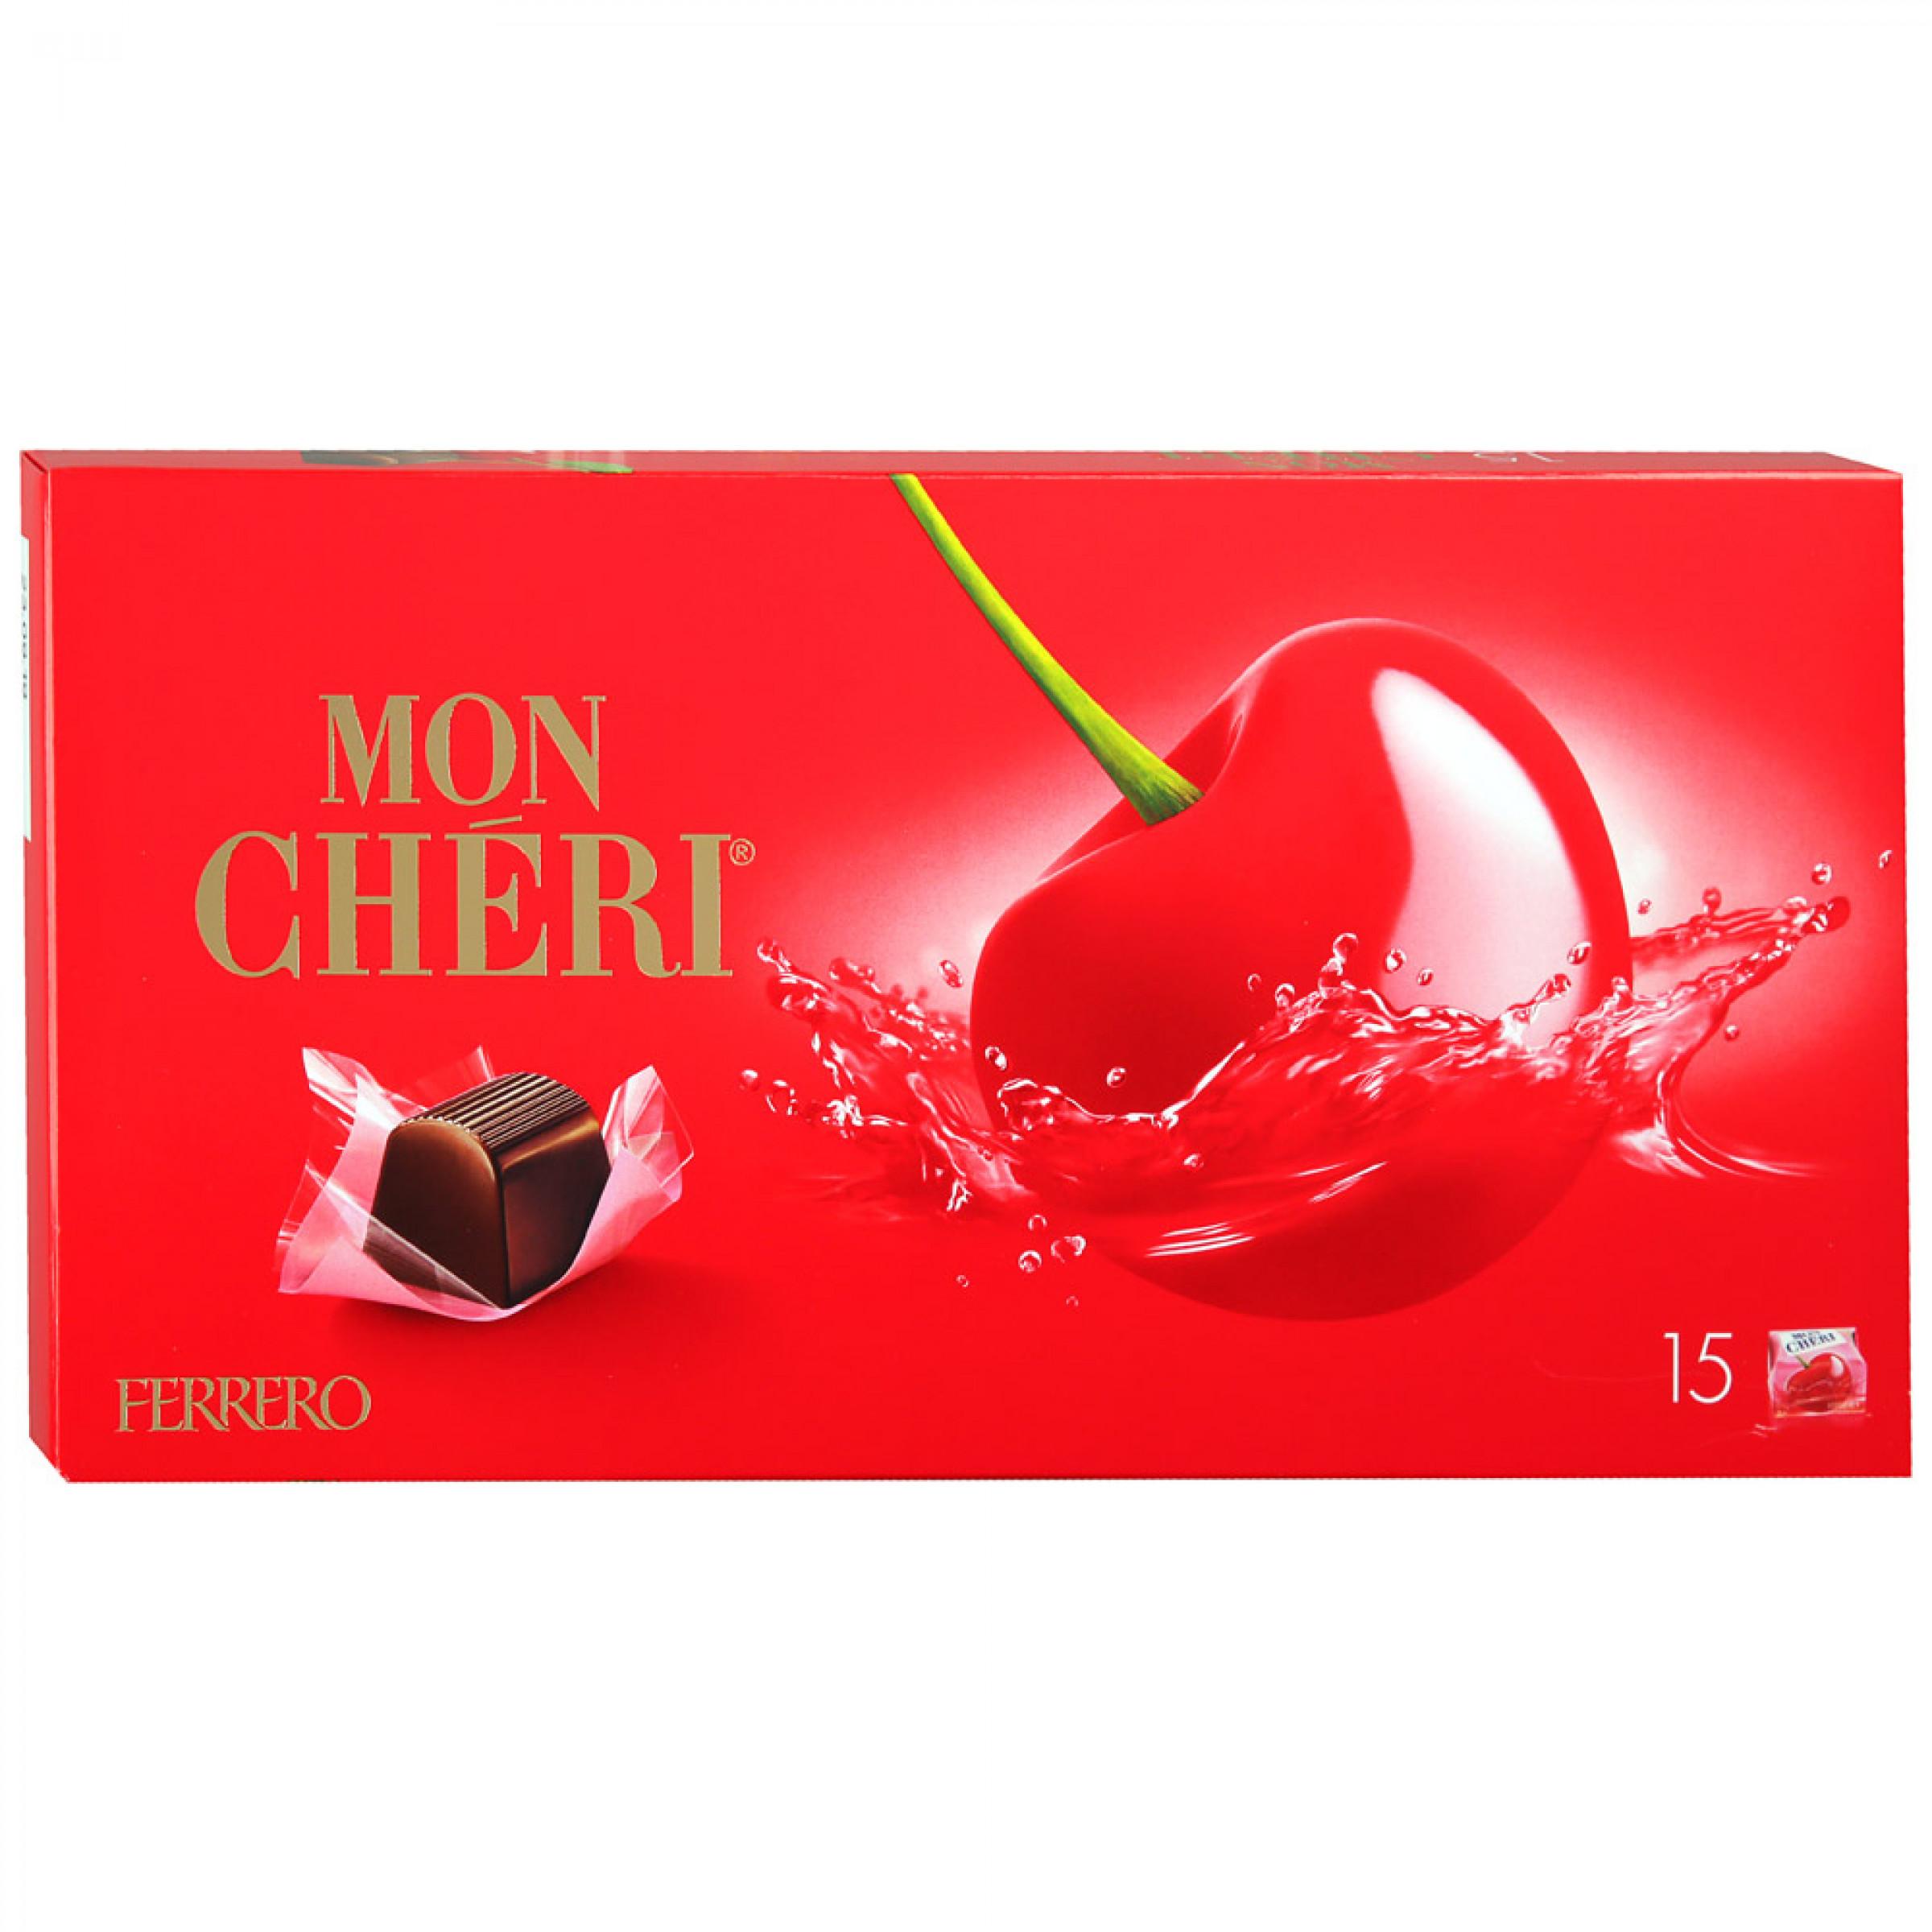 "Конфеты с вишней и ликером Mon Cheri ""Ferrero"", 157. 5гр"